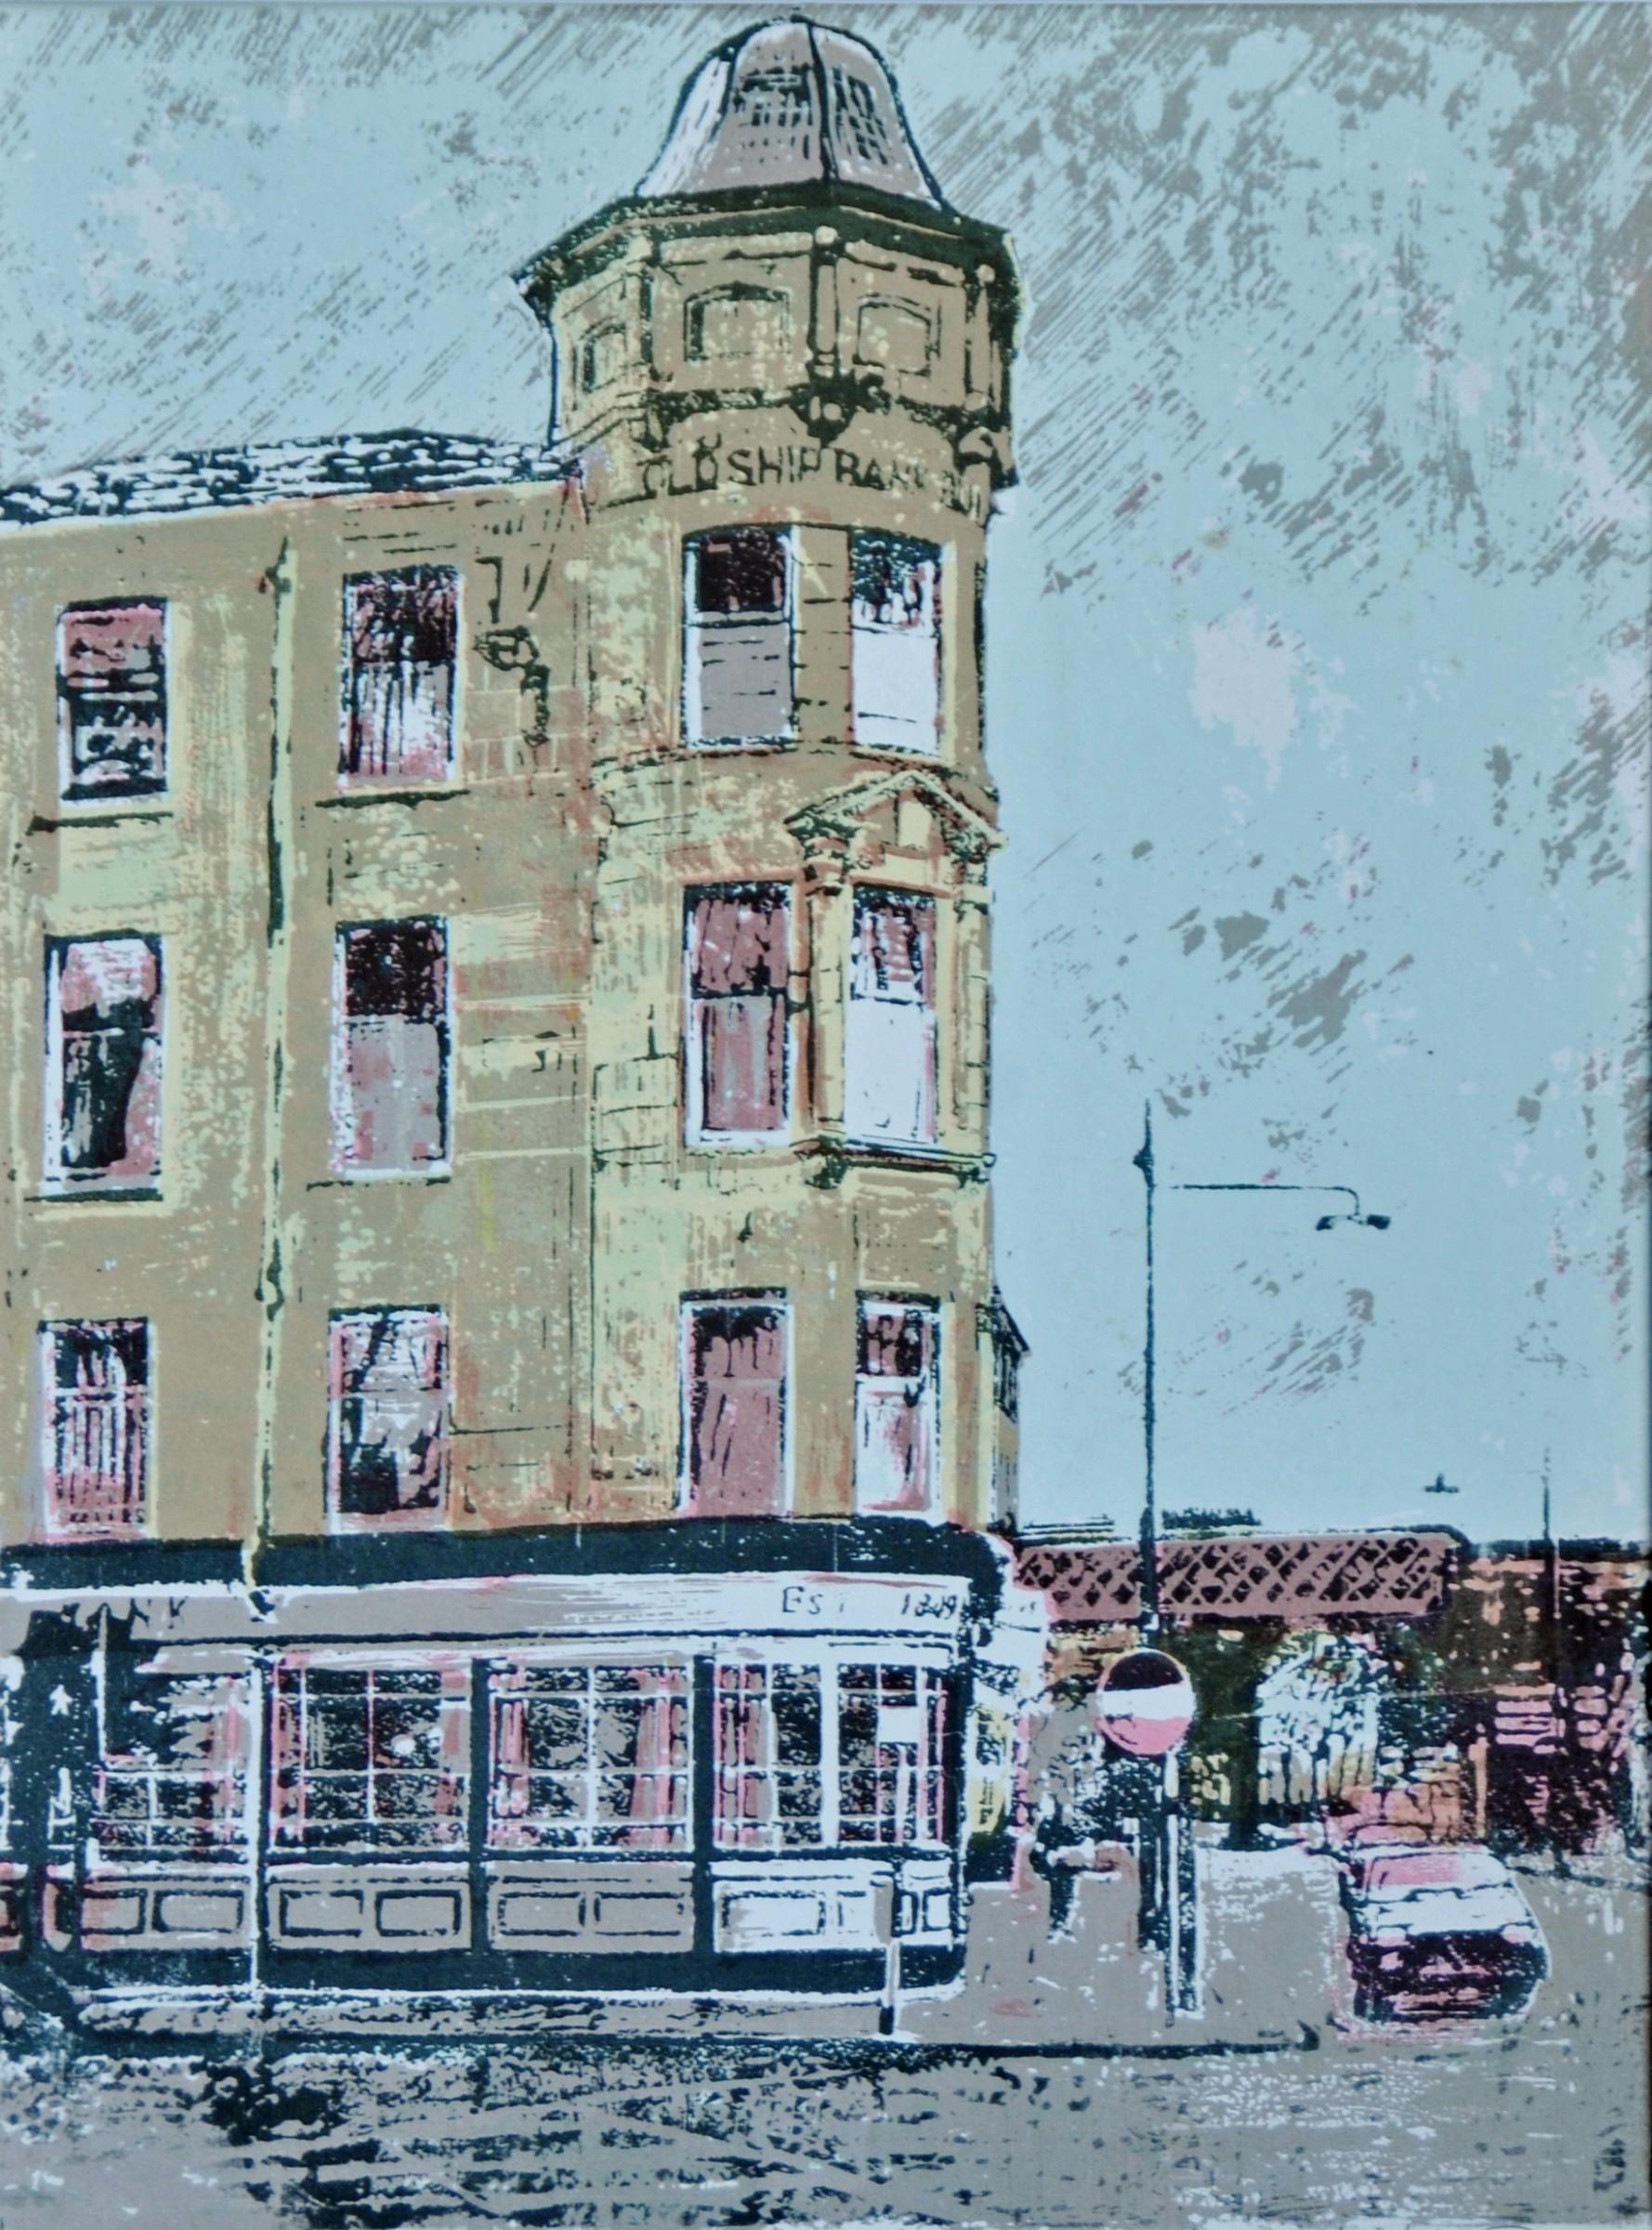 "<span class=""link fancybox-details-link""><a href=""/artists/128-thomas-walsh-re/works/9483/"">View Detail Page</a></span><div class=""artist""><span class=""artist""><strong>Thomas Walsh RE</strong></span></div><div class=""title""><em>The Old Ship Bank Inn, Saltmarket, Glasgow</em></div><div class=""medium"">linocut</div>"